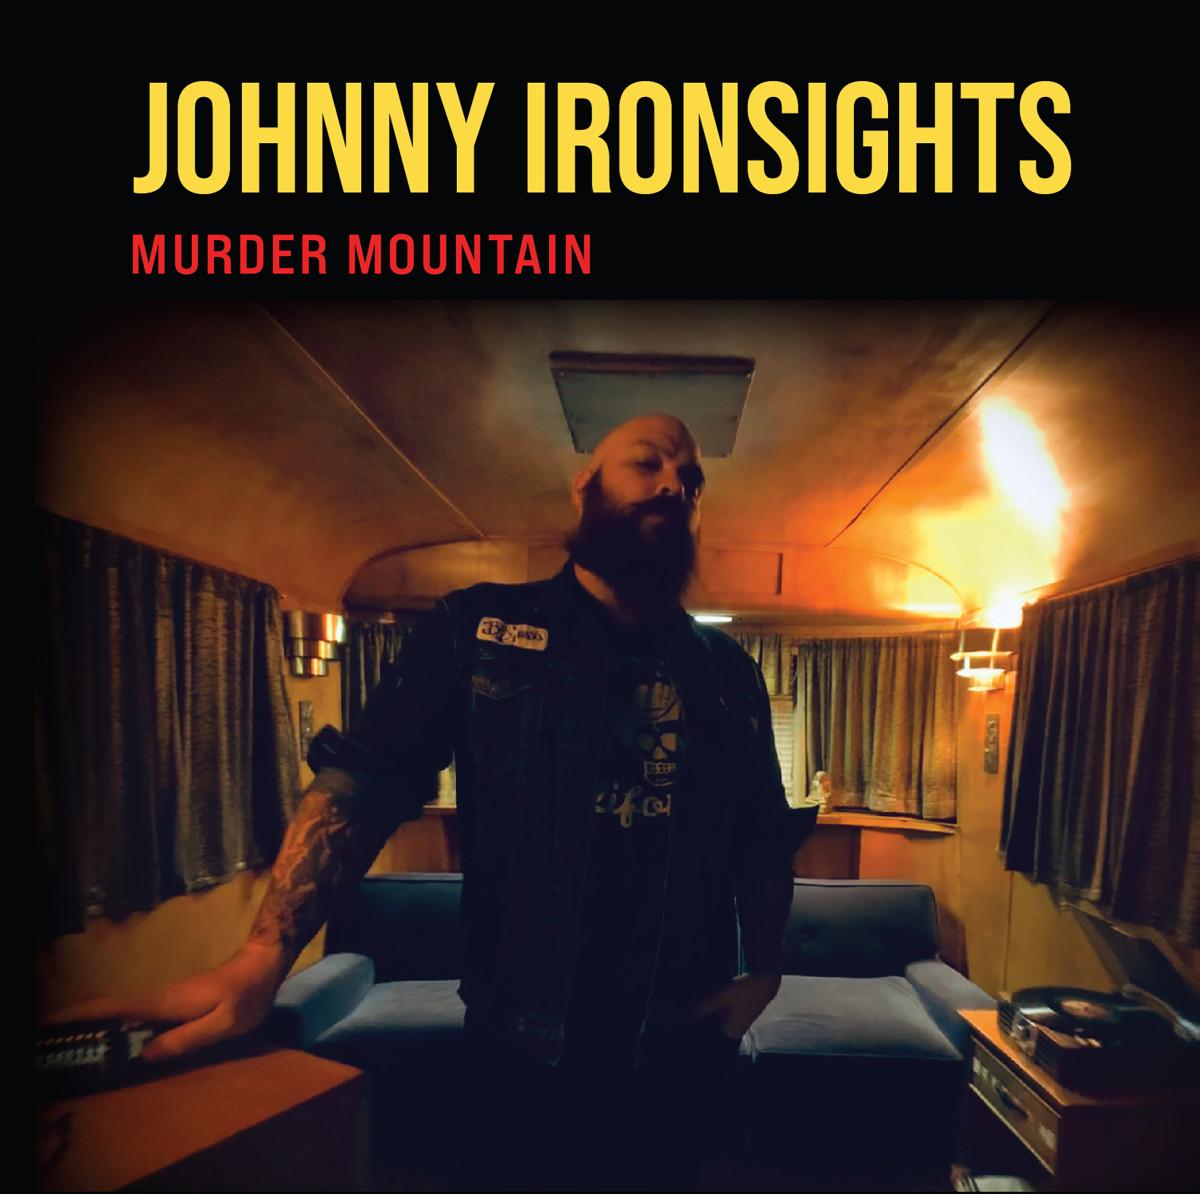 Johnny Ironsights Murder Mountain